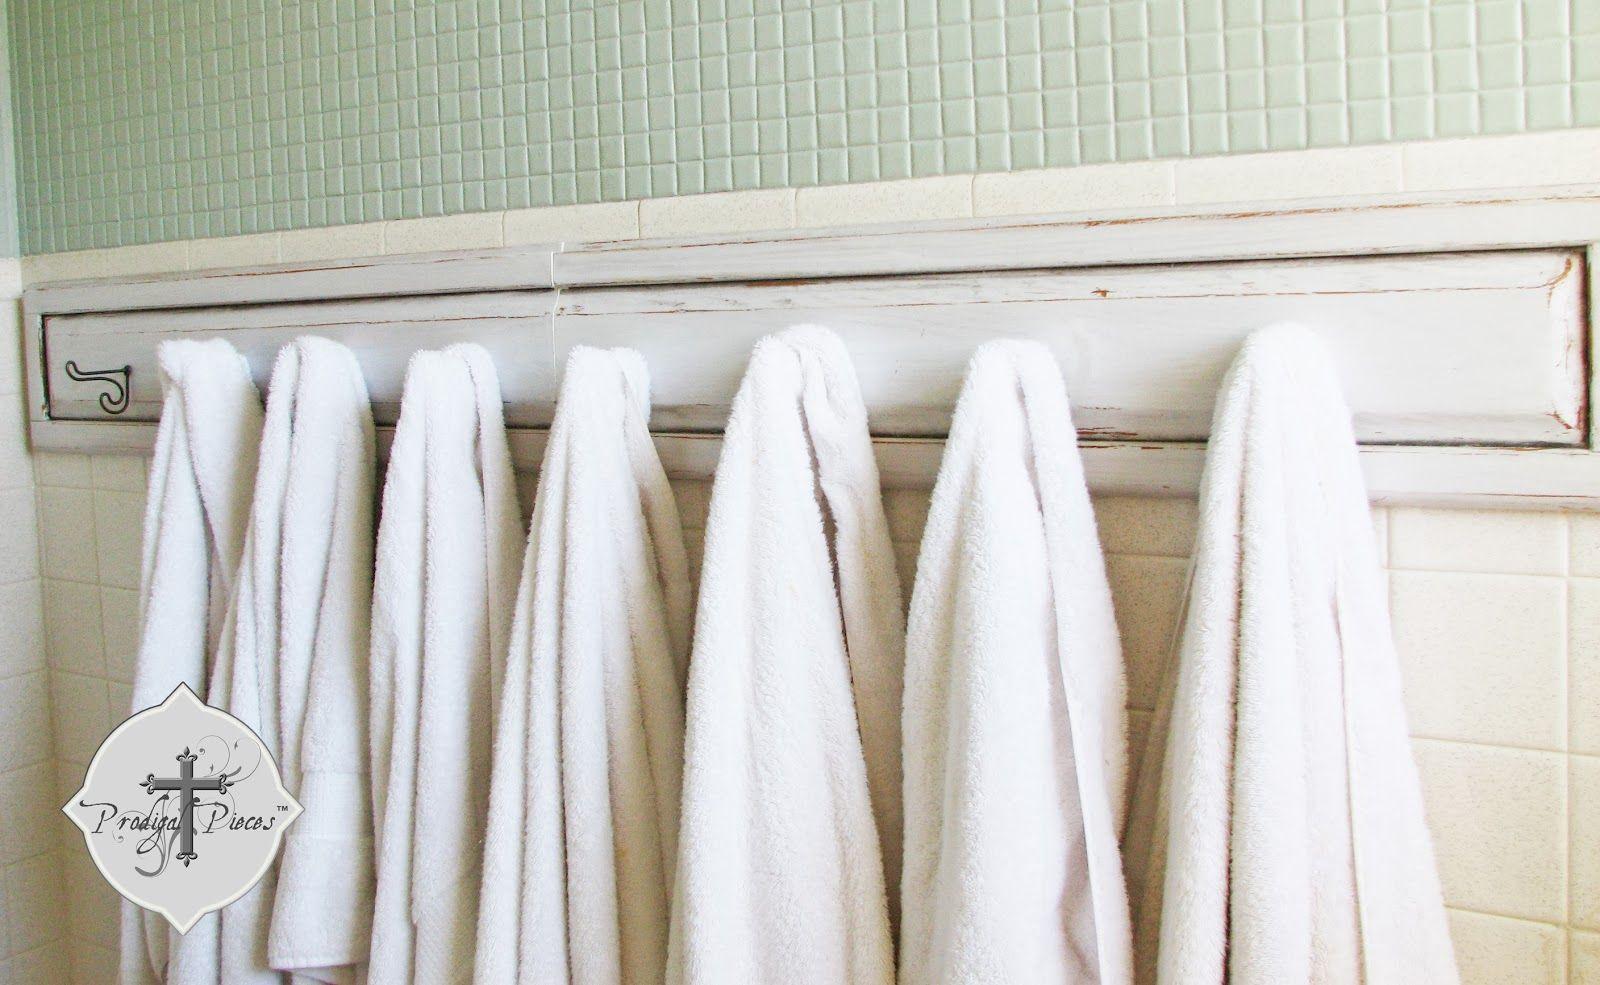 bathroom hook ideas   Rack Ideas With Towel Hook At Gray Ceramic Wall Tiled In Guys Bathroom ...